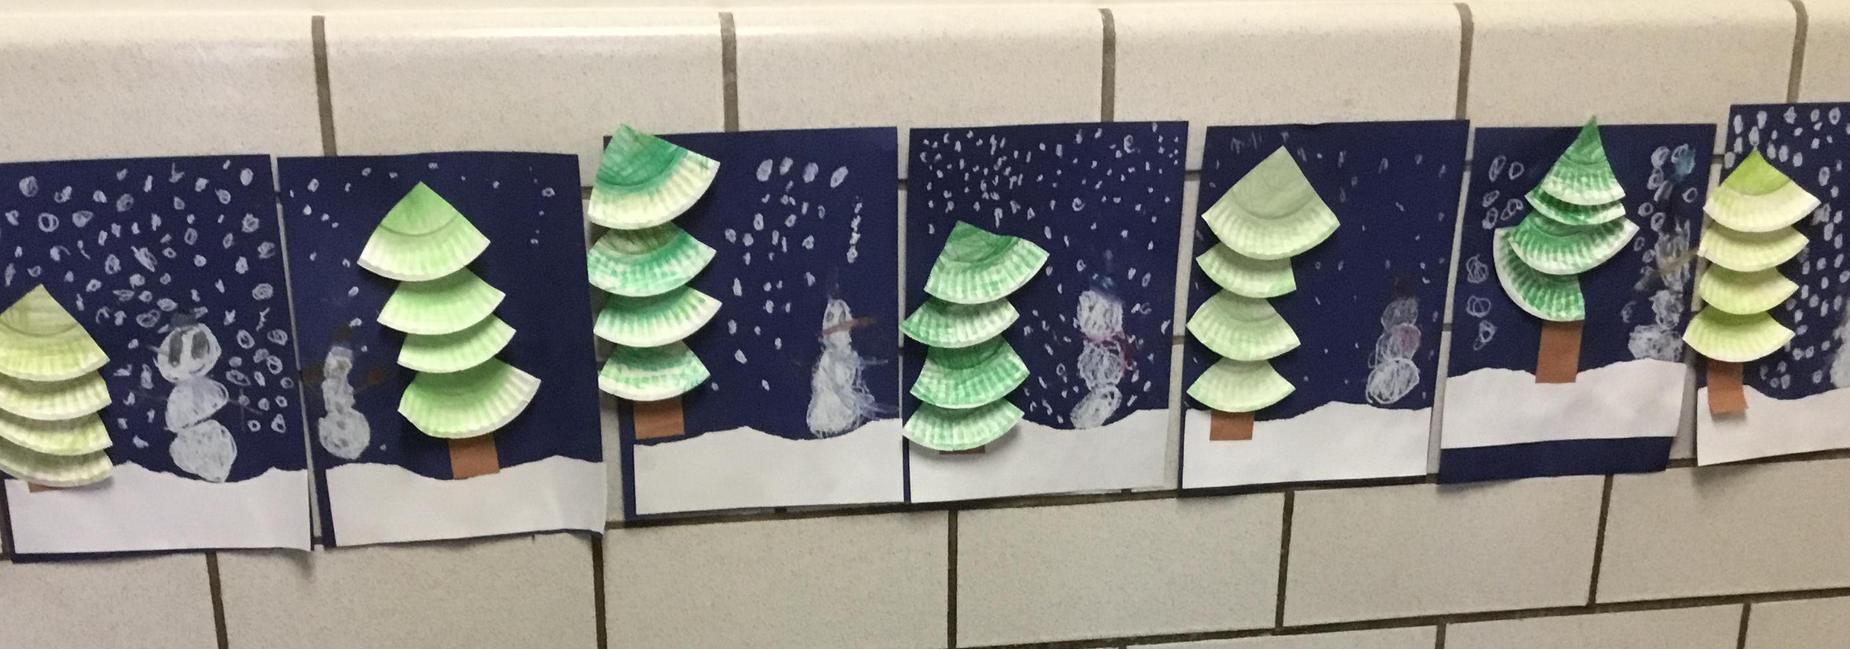 Student artwork trees and snowmen